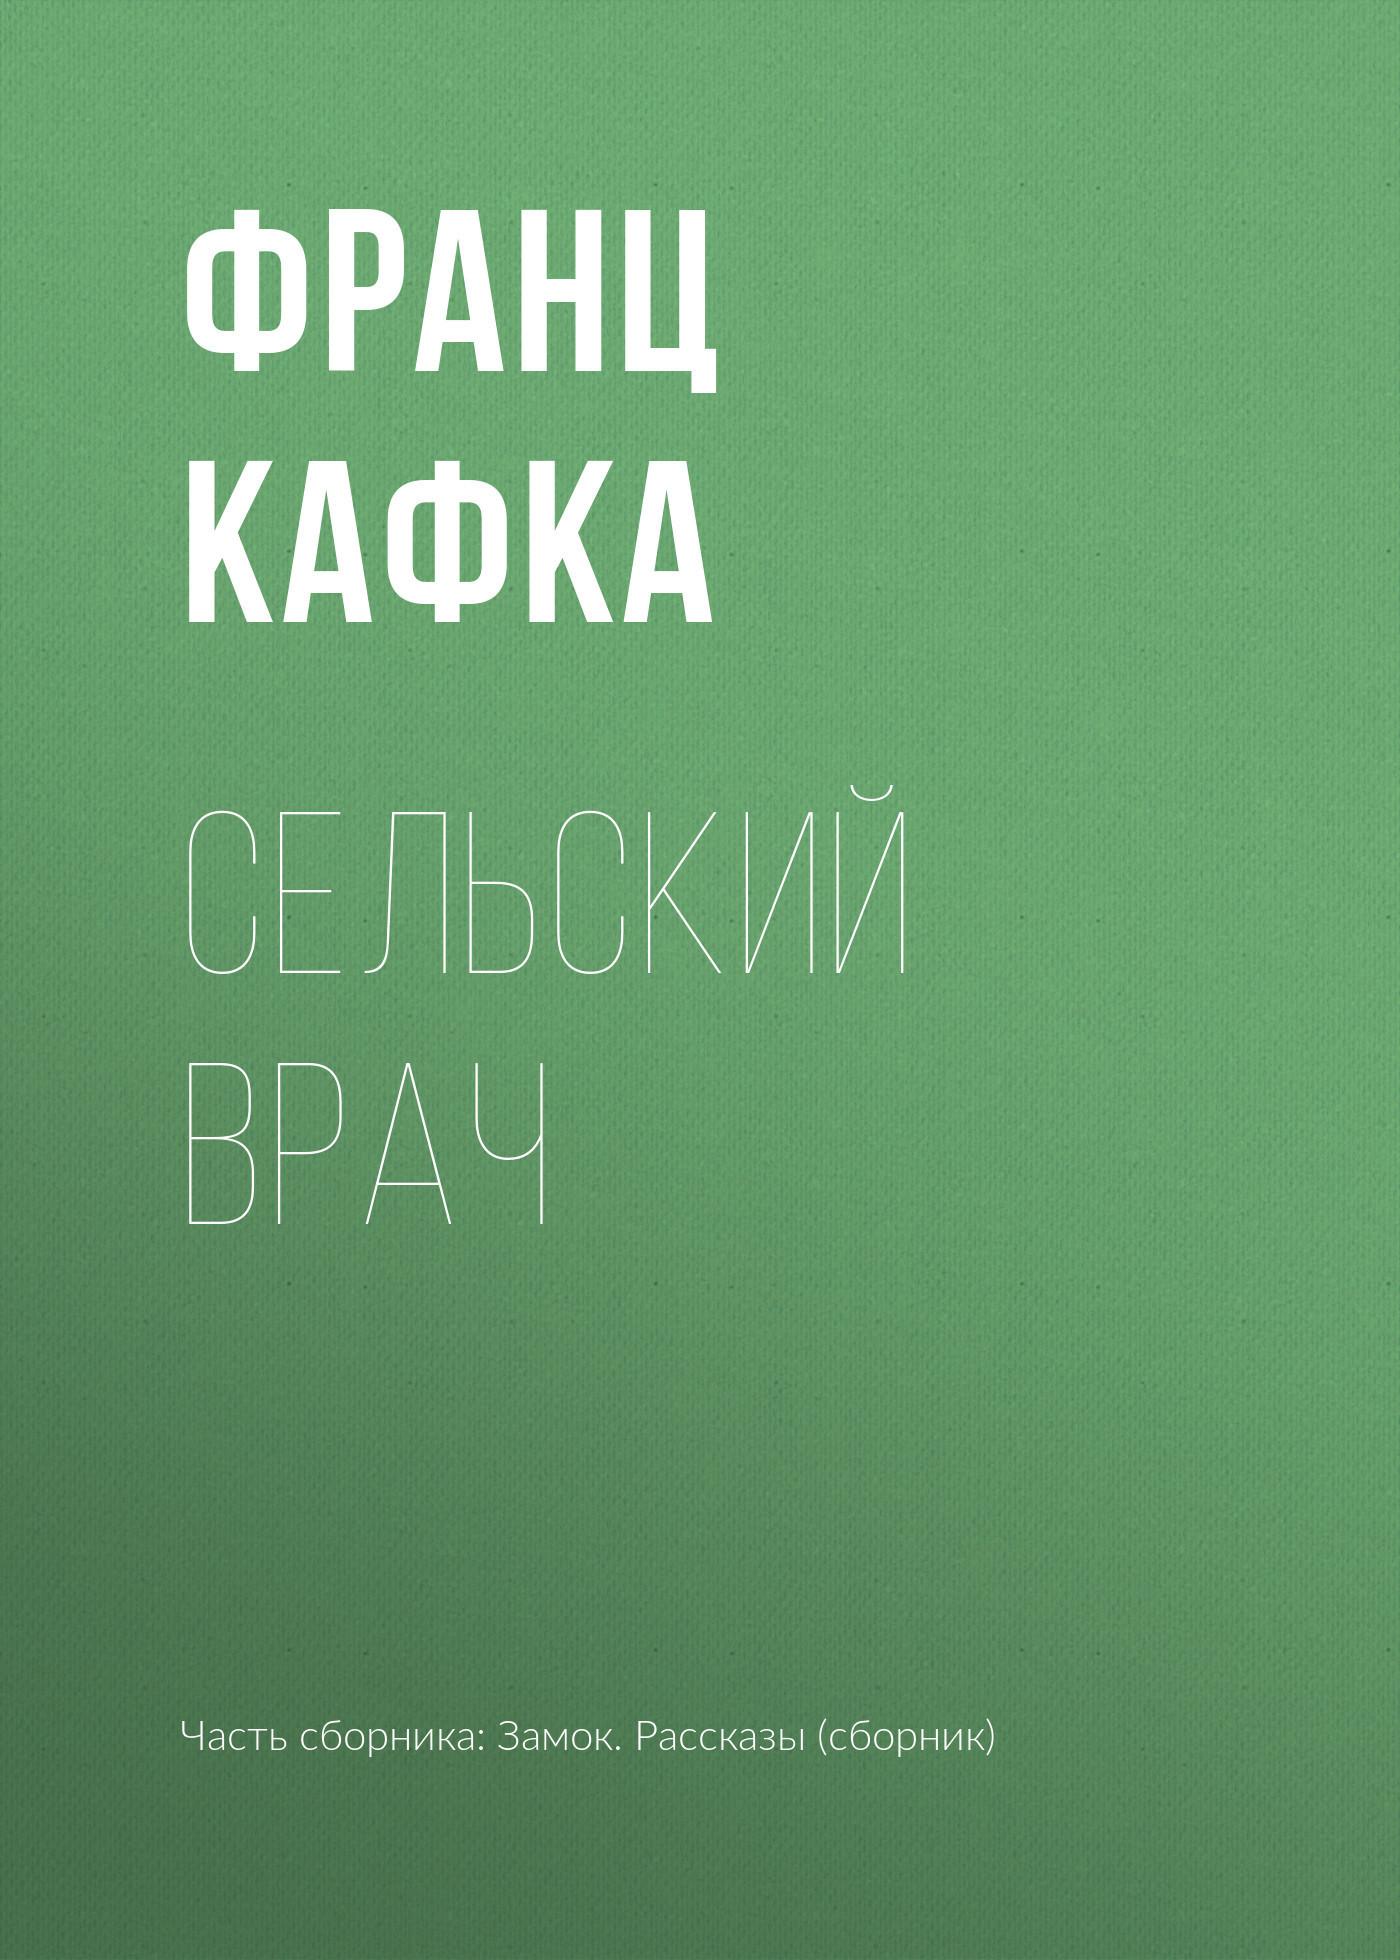 Франц Кафка. Сельский врач